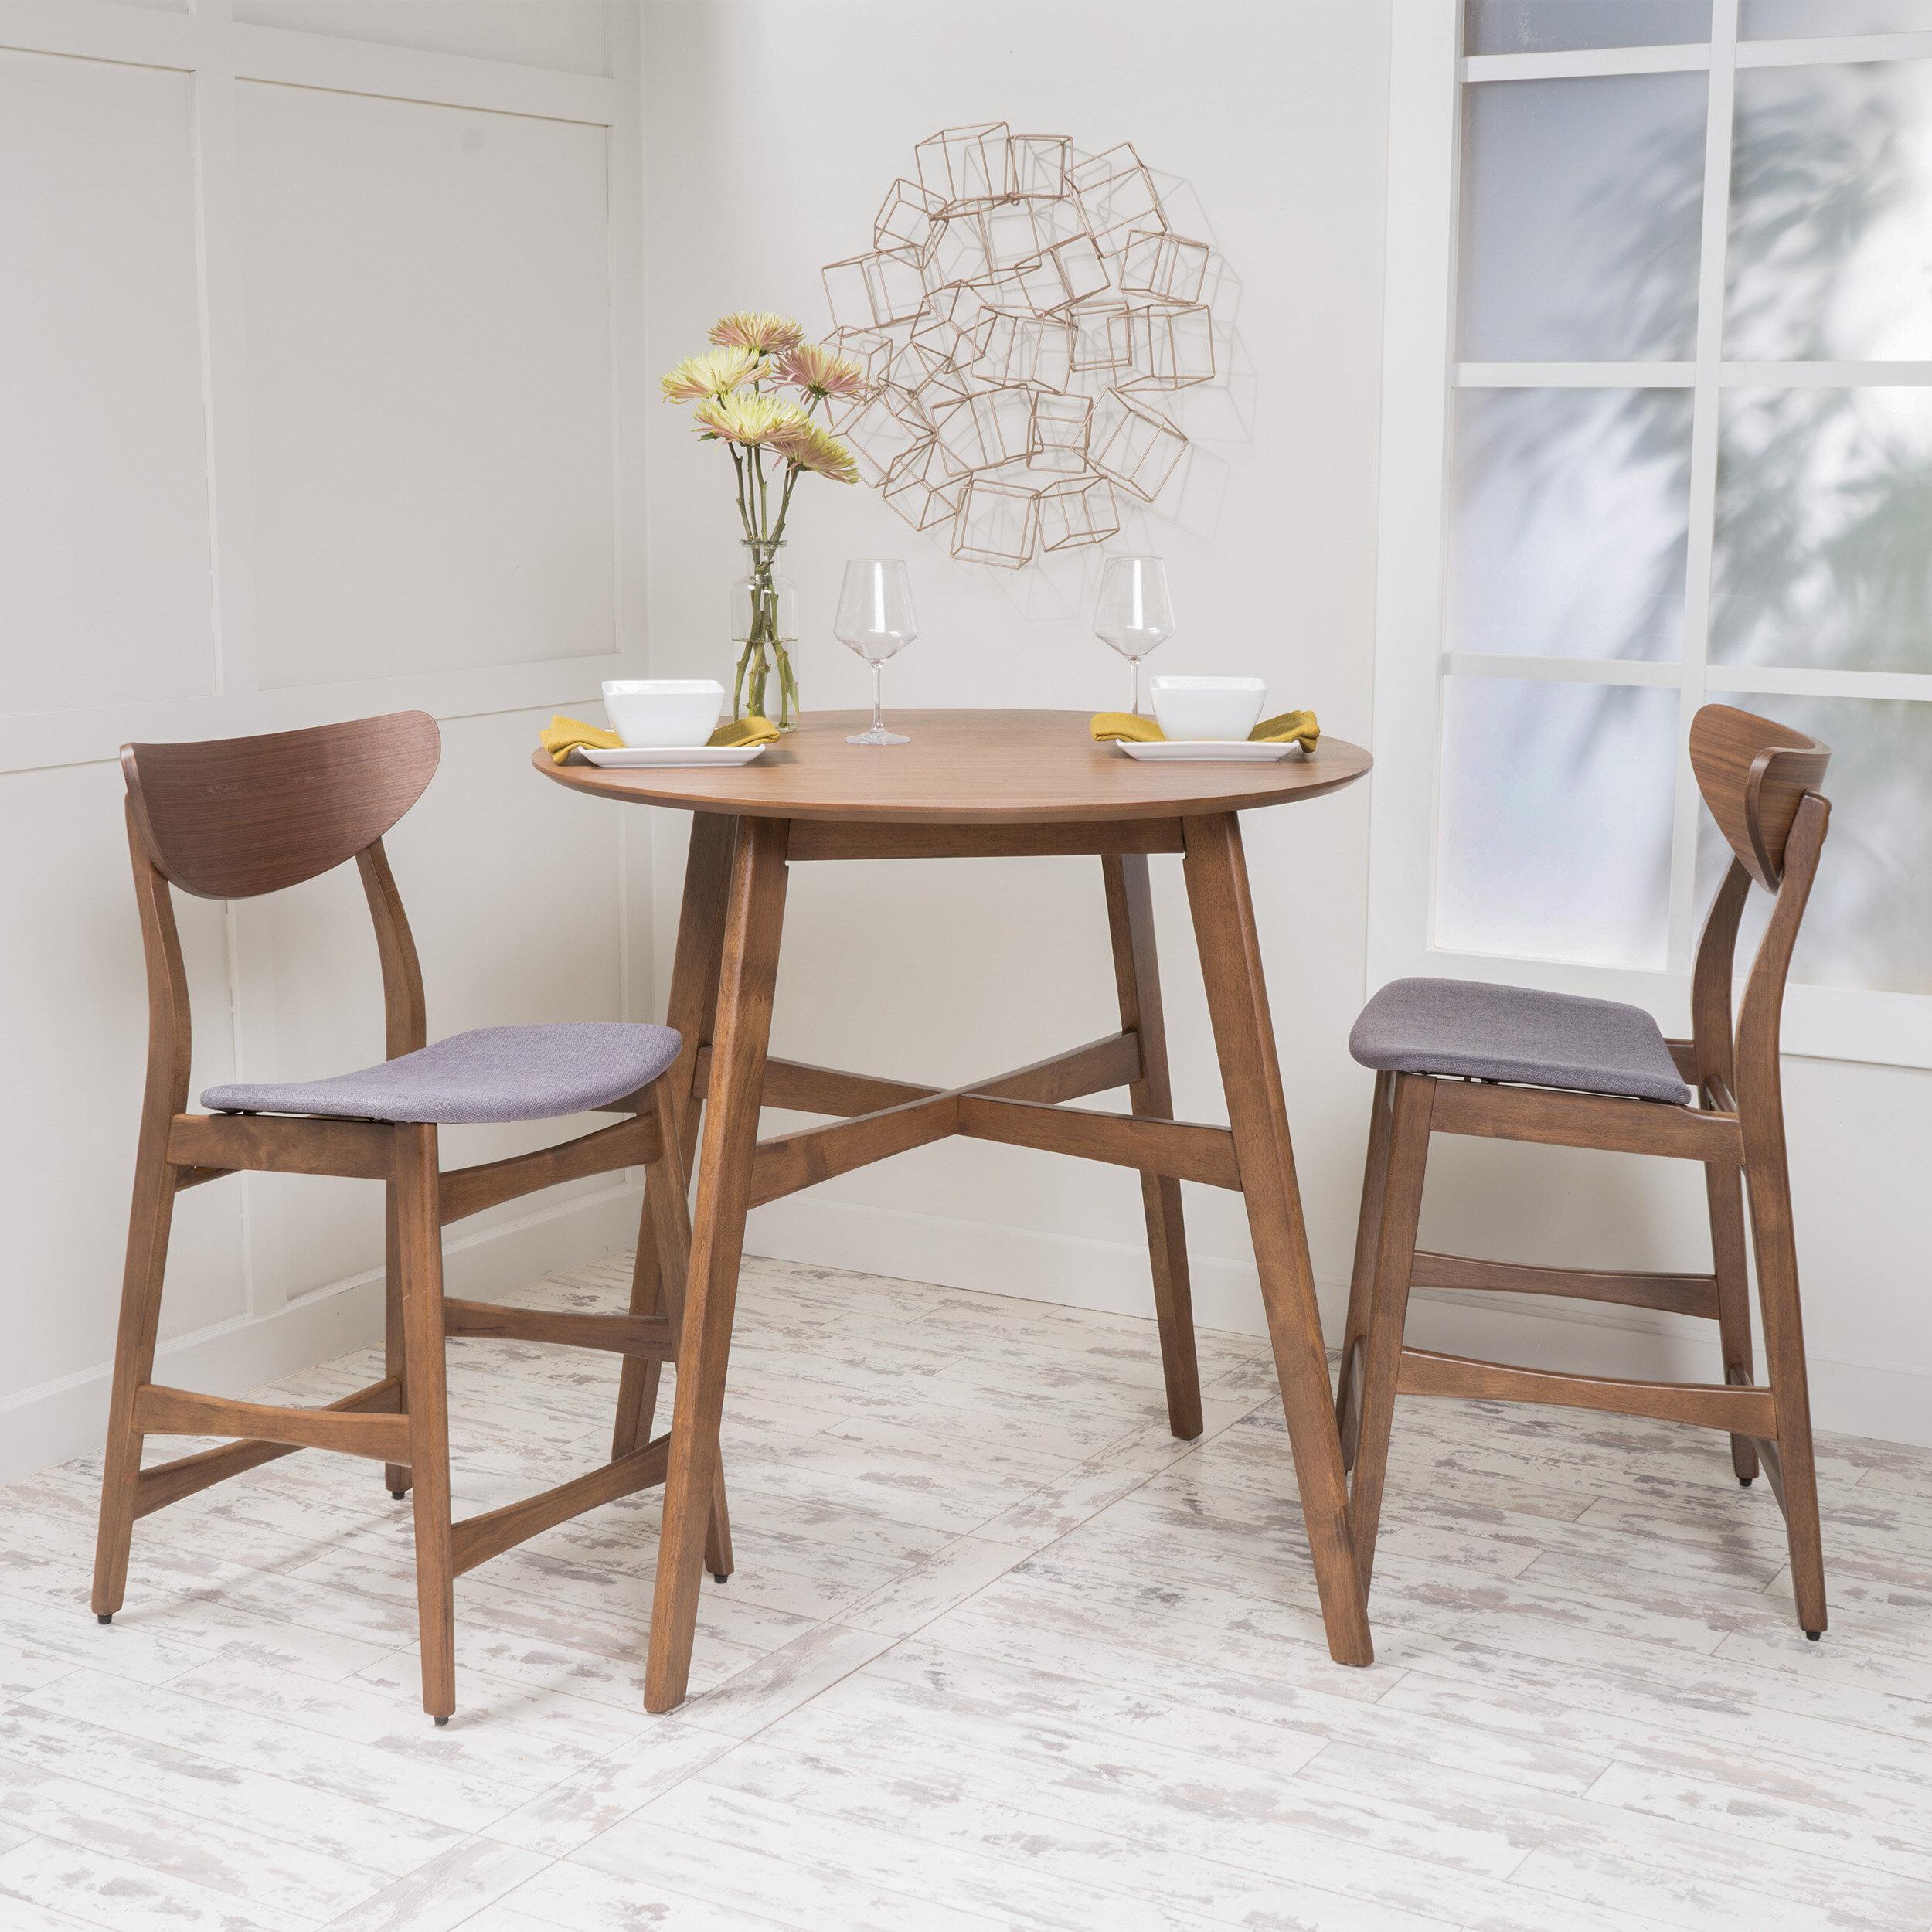 Superb Santa Cruz 3 Piece Counter Height Dining Set Andrewgaddart Wooden Chair Designs For Living Room Andrewgaddartcom